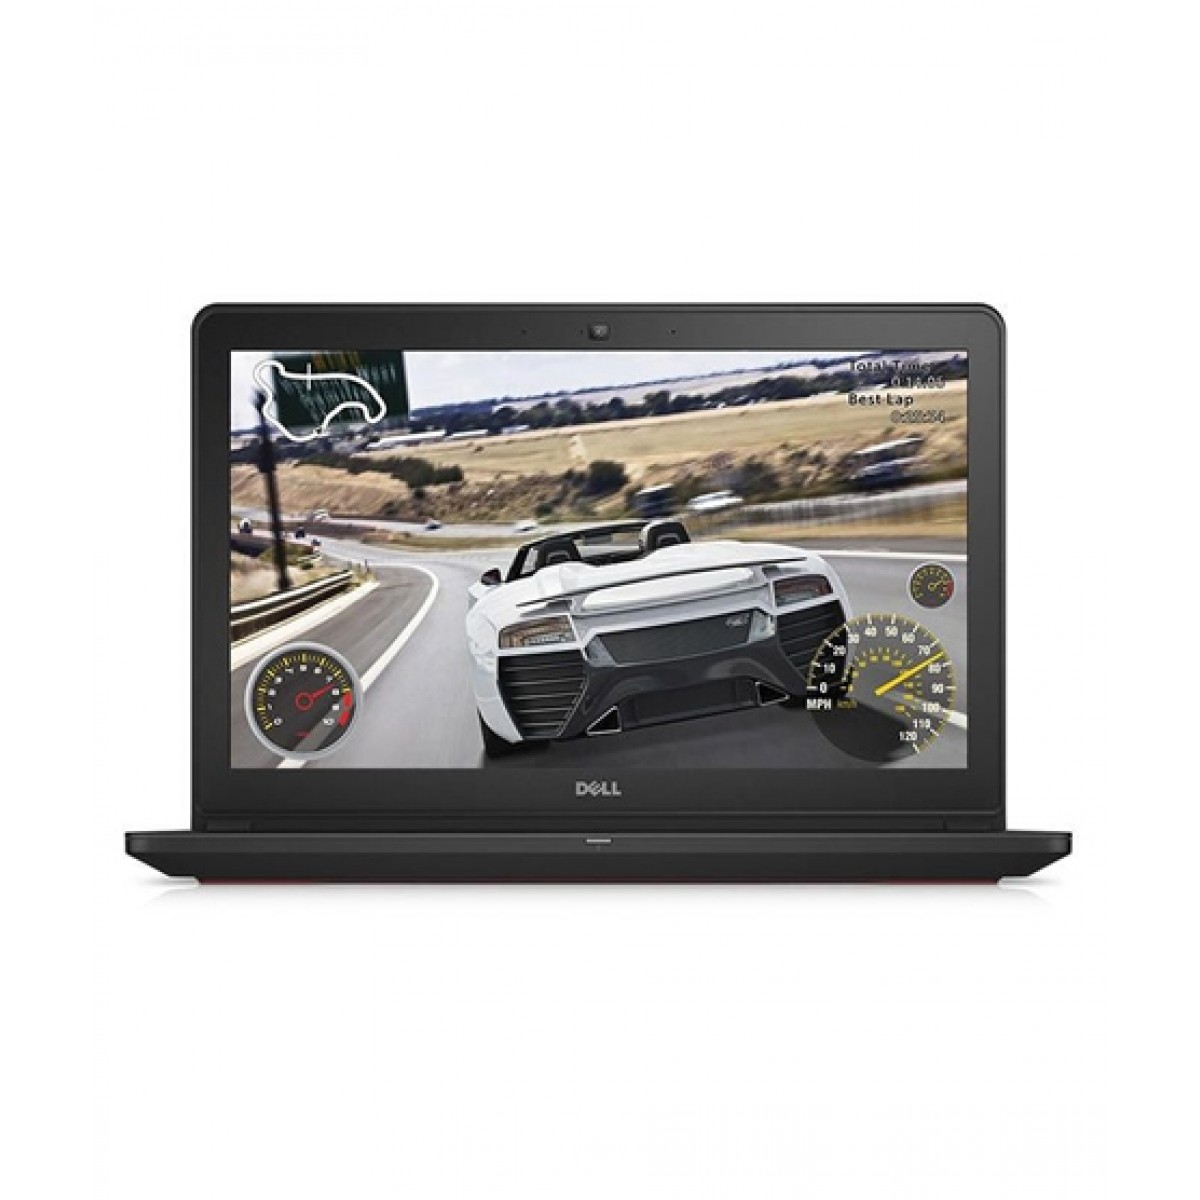 Dell Inspiron 15 Core I5 6th Gen 500GB Laptop Price In